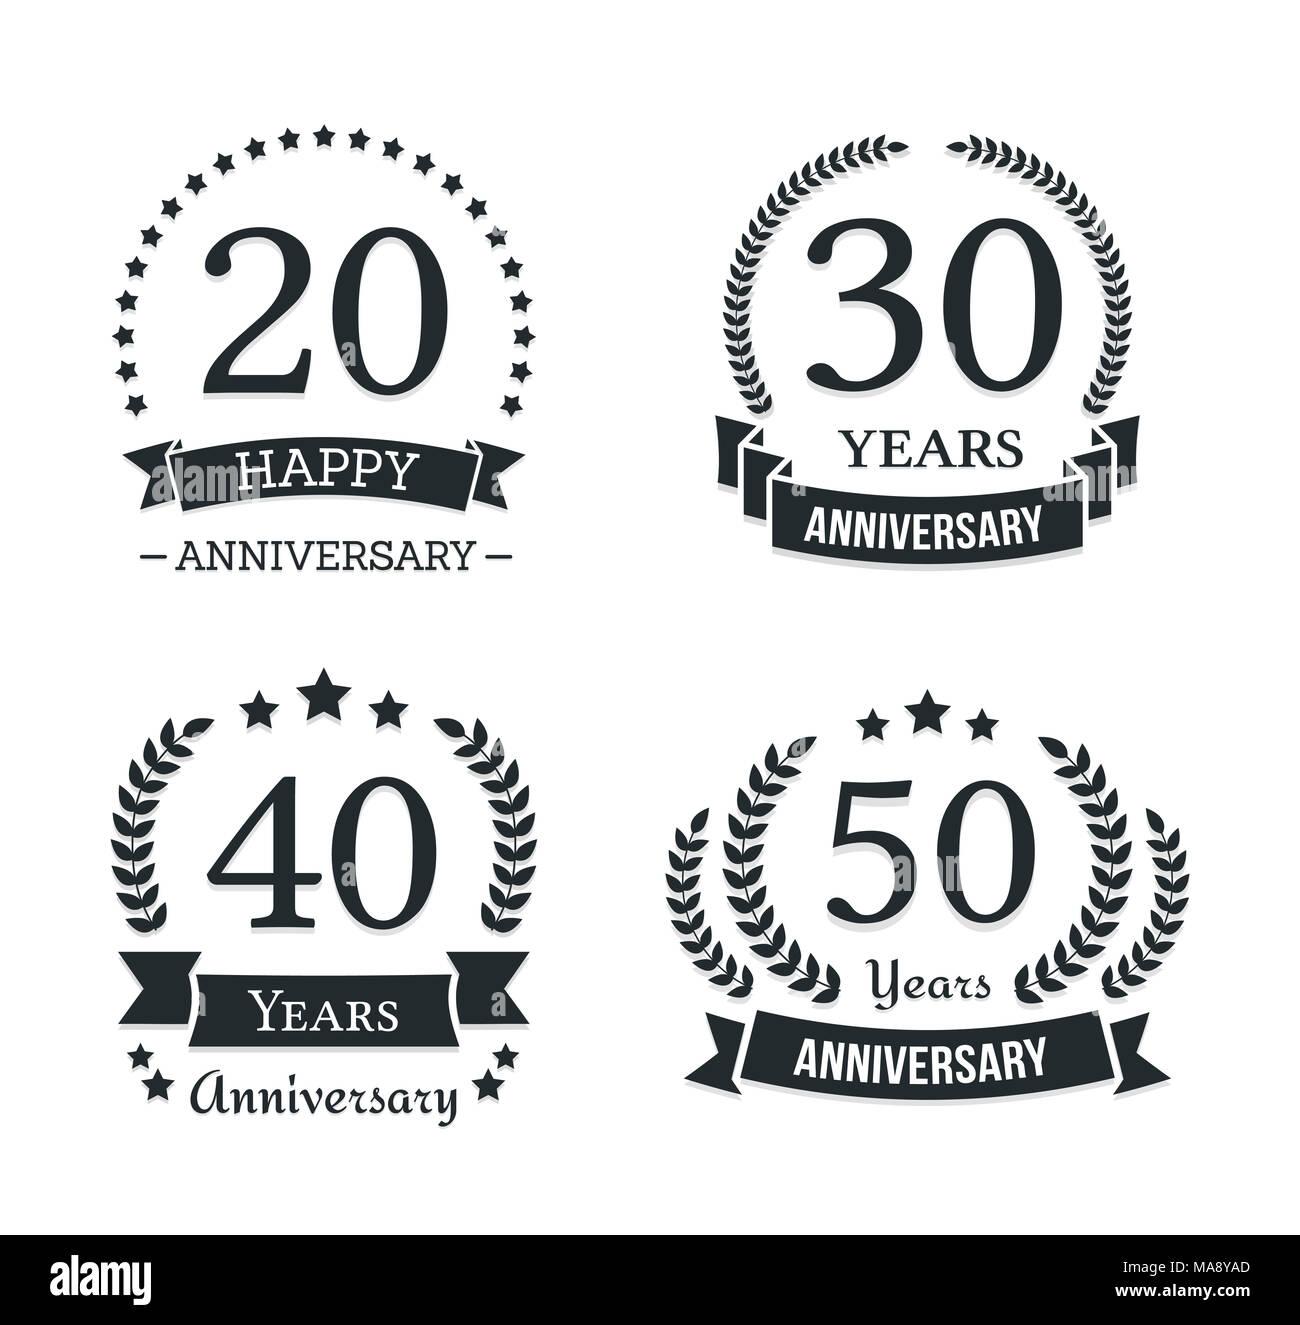 4 different anniversary logo templates anniversary emblems vector